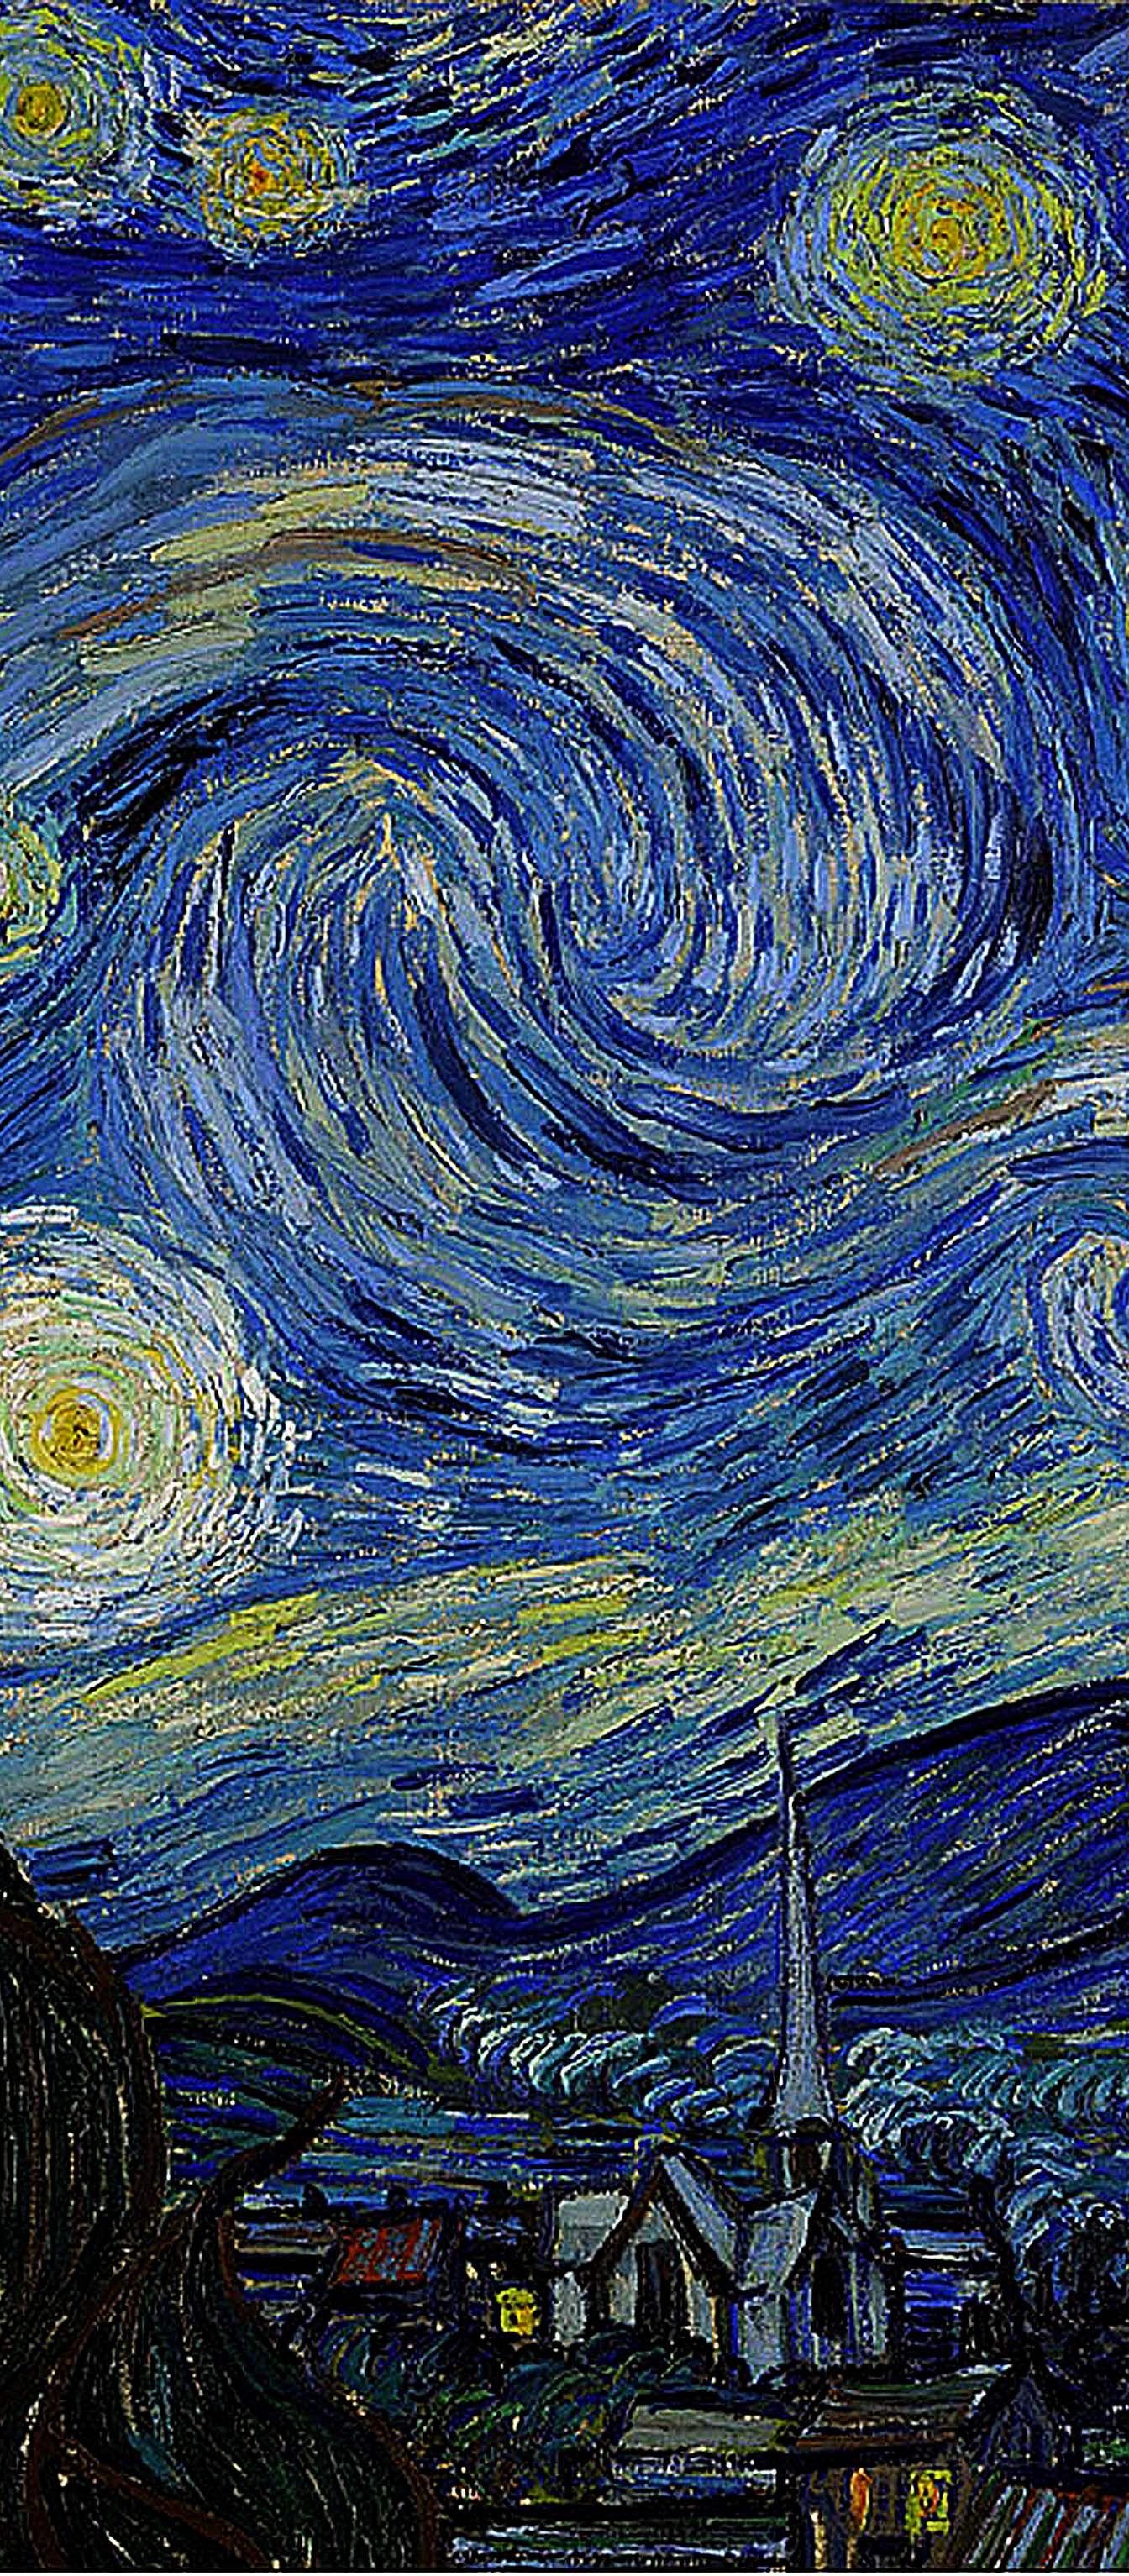 Vincent Van Gogh Starry Night Detail Center Van Gogh Wallpaper